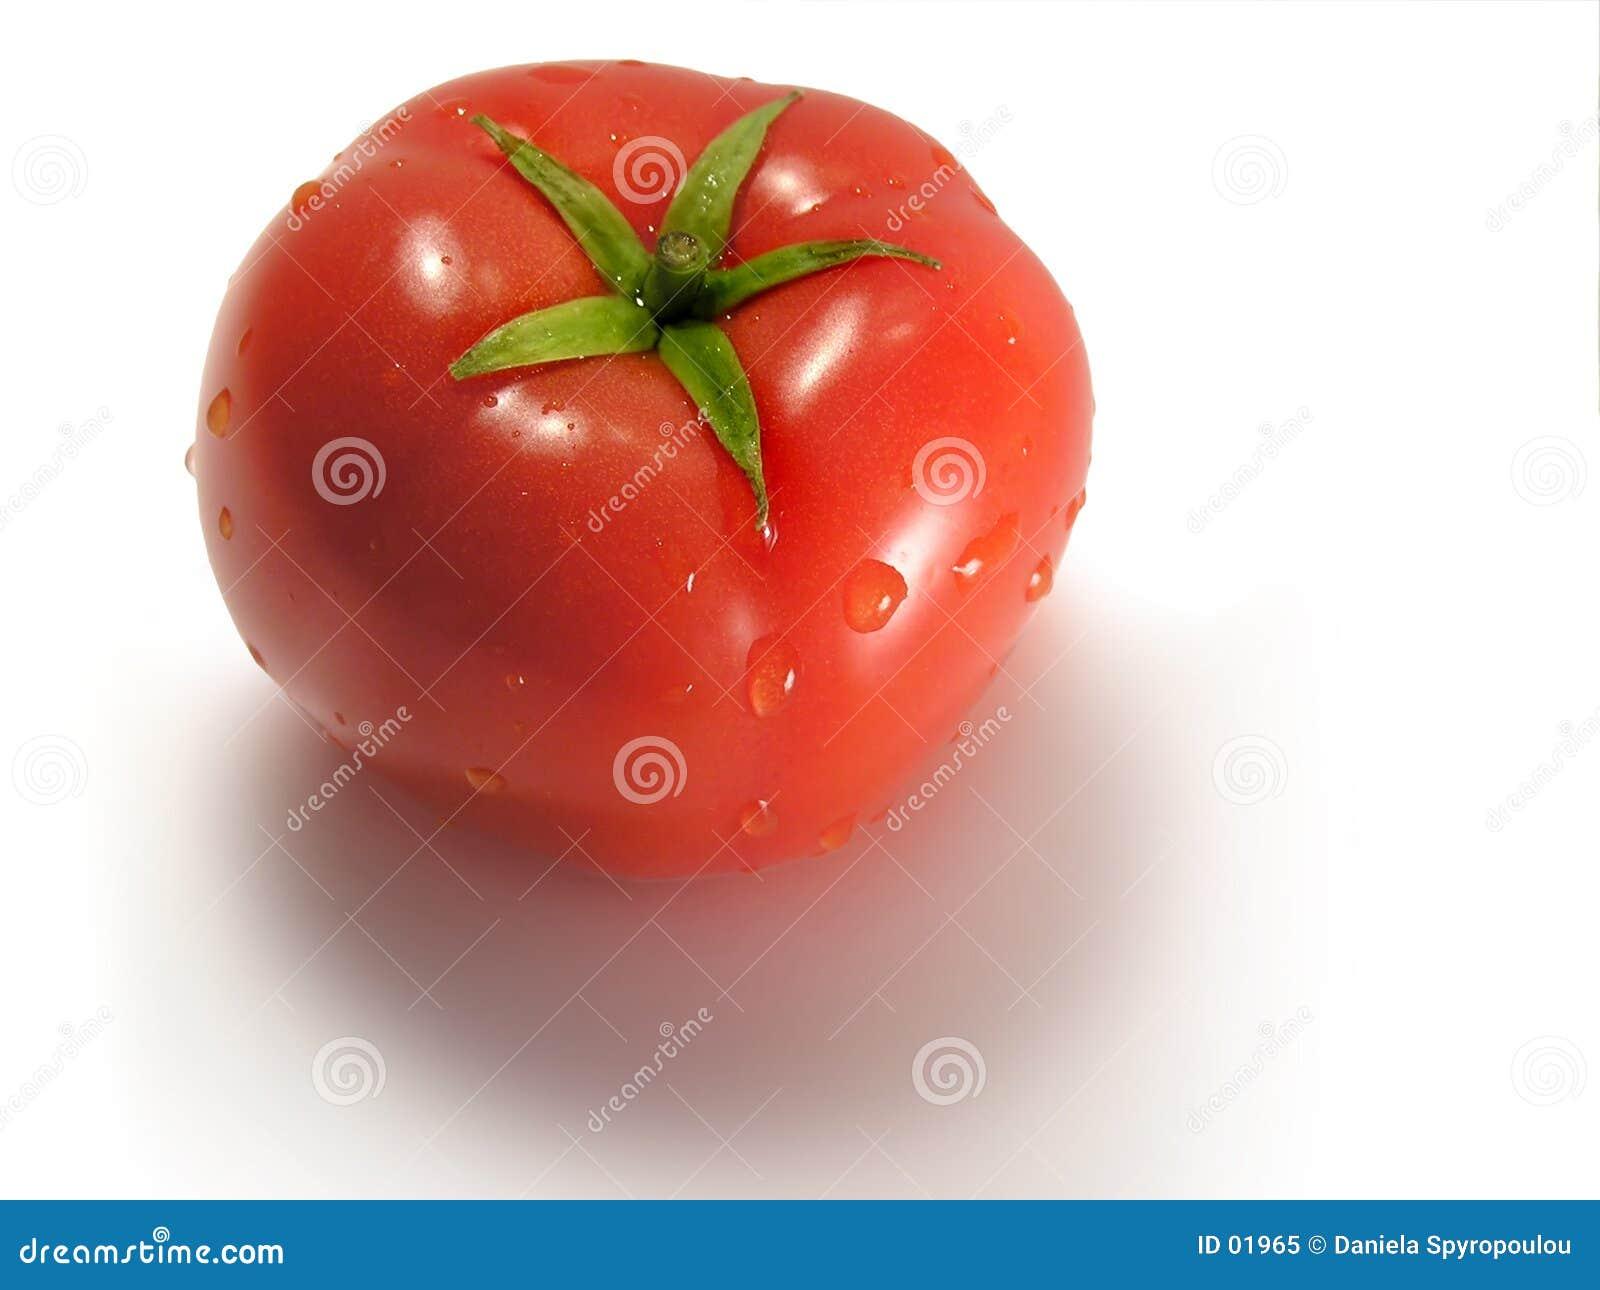 Download στενή ντομάτα επάνω στοκ εικόνα. εικόνα από μάγειρας, σαλάτα - 1965